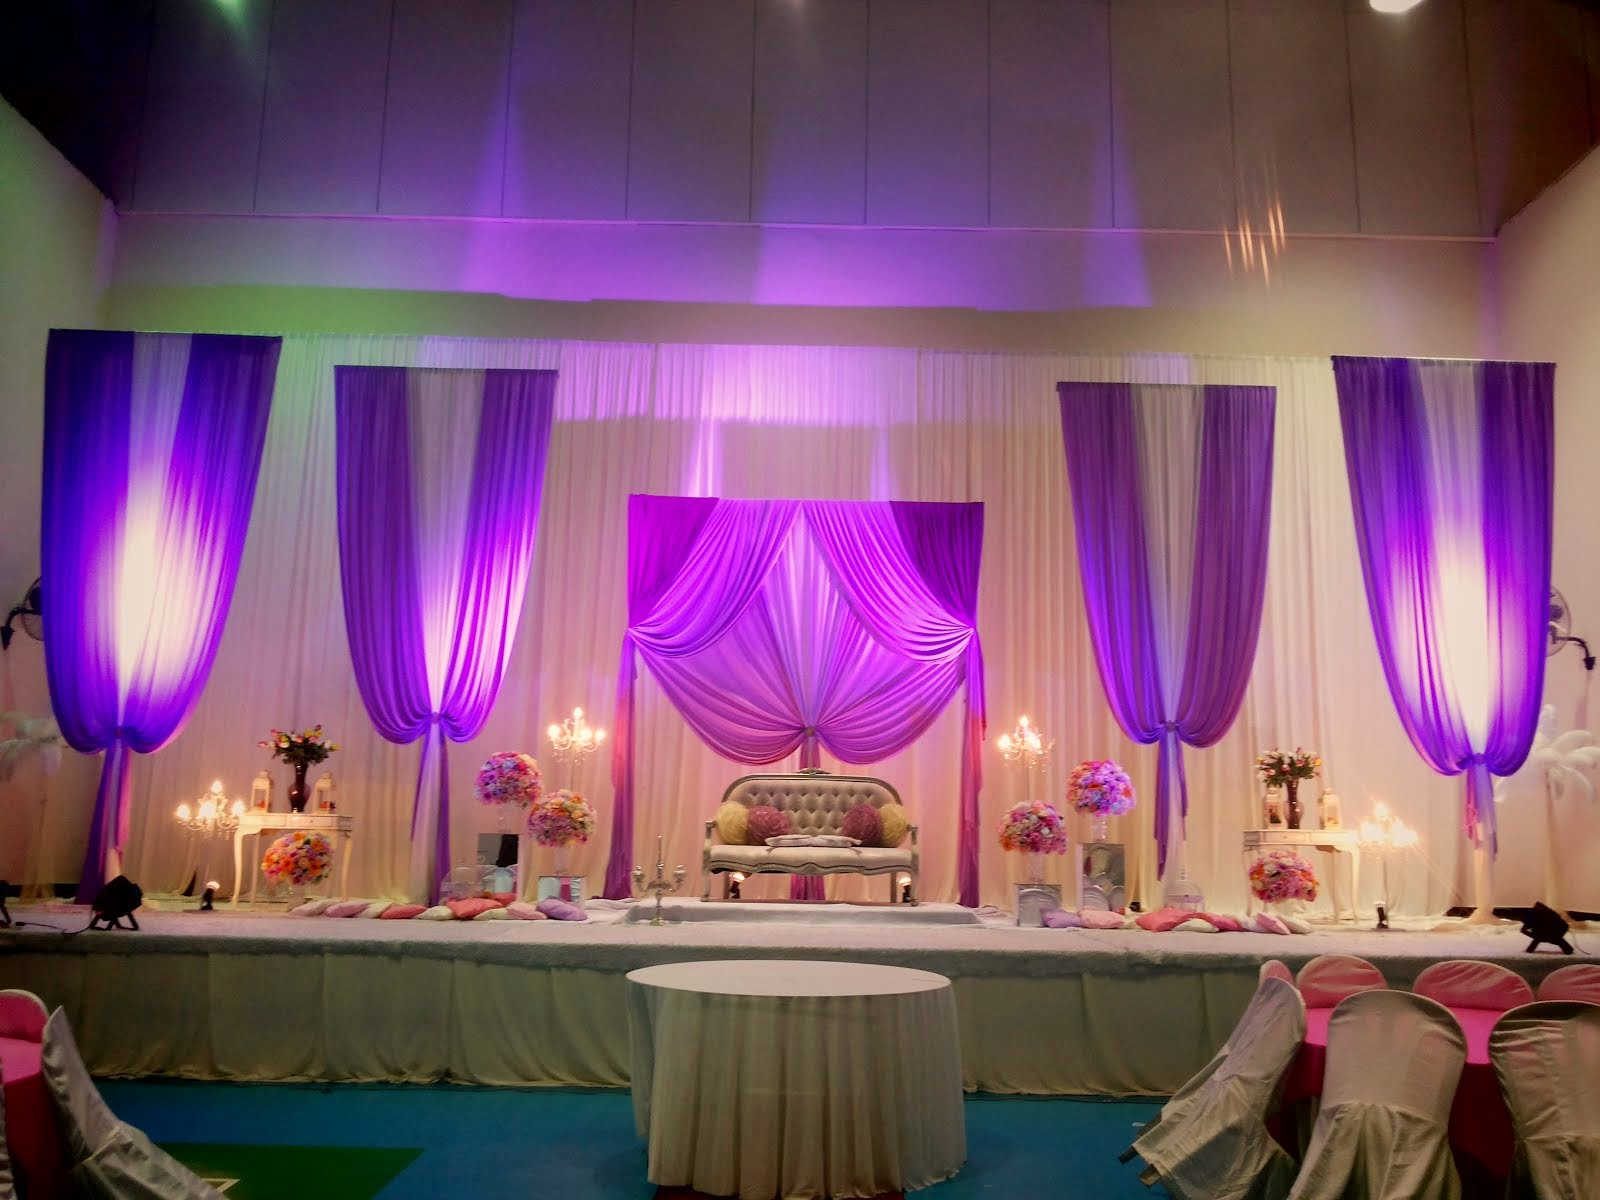 Pelamin dewan 5 panel 6 Flower Stand,Red Carpet,Pintu Gerbang RM2700.00